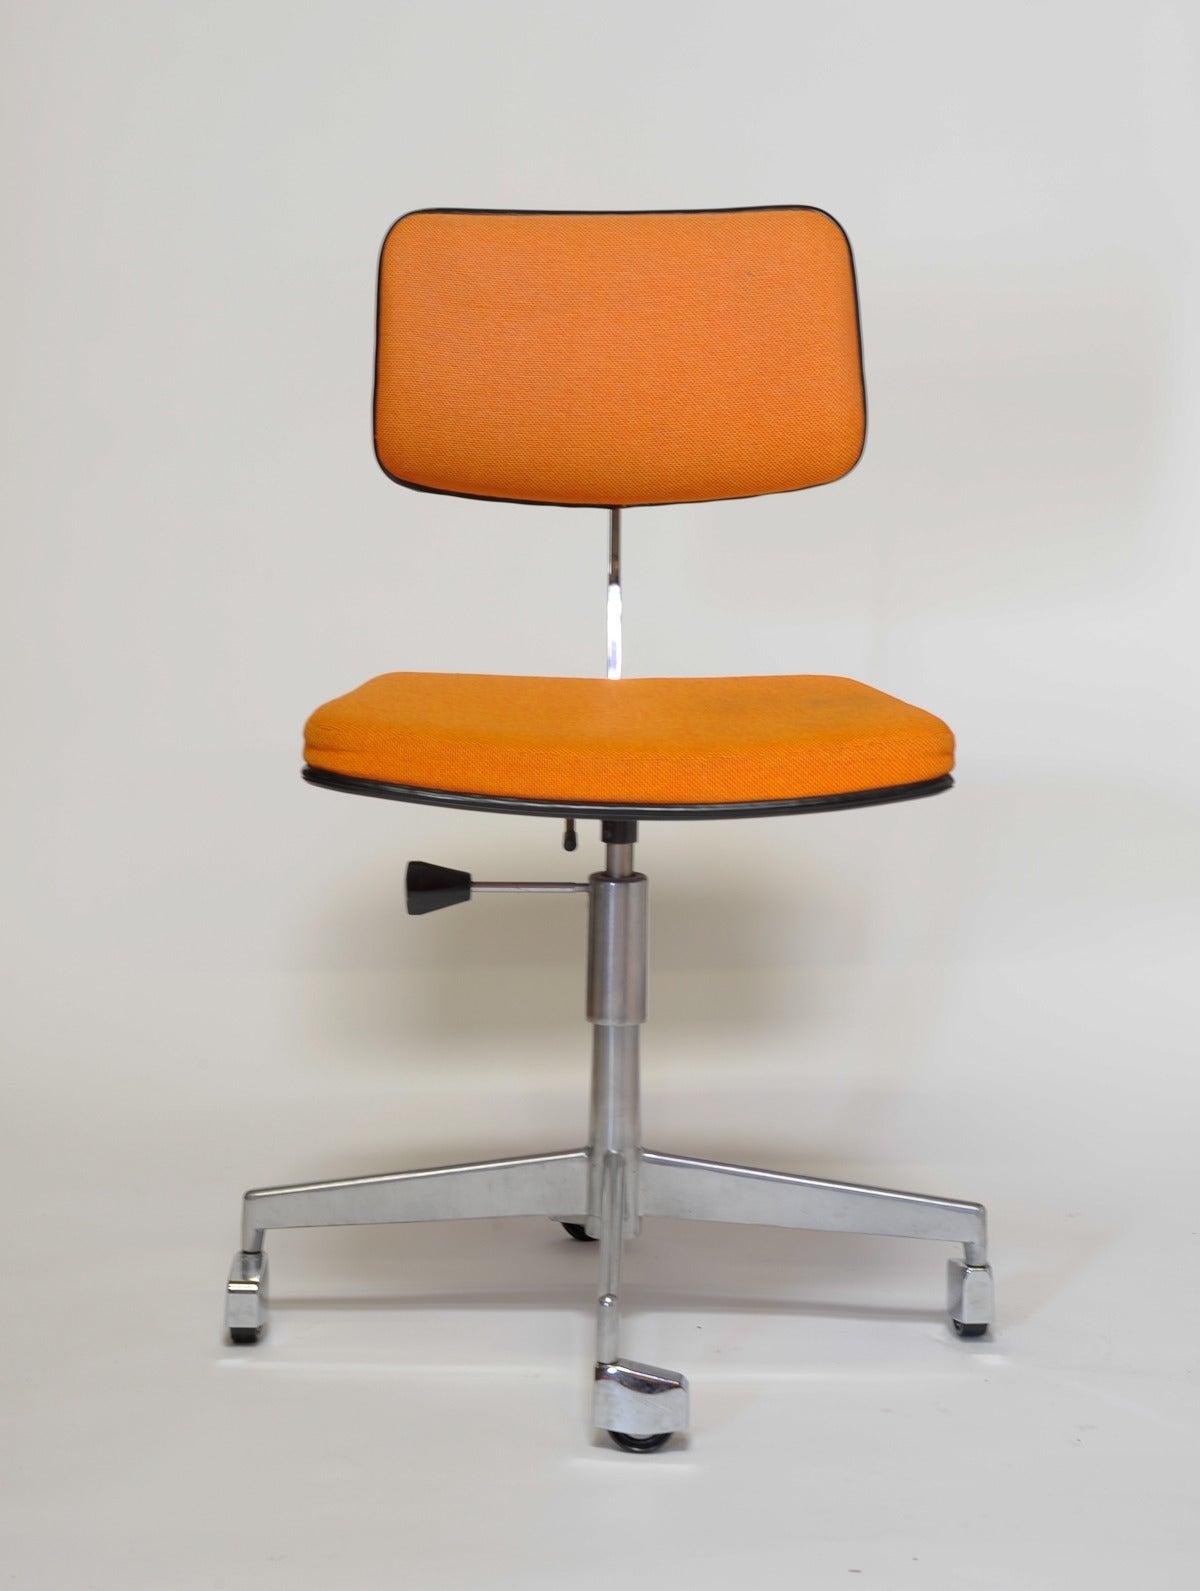 1960s Labofa Danish Rolling fice Chair at 1stdibs